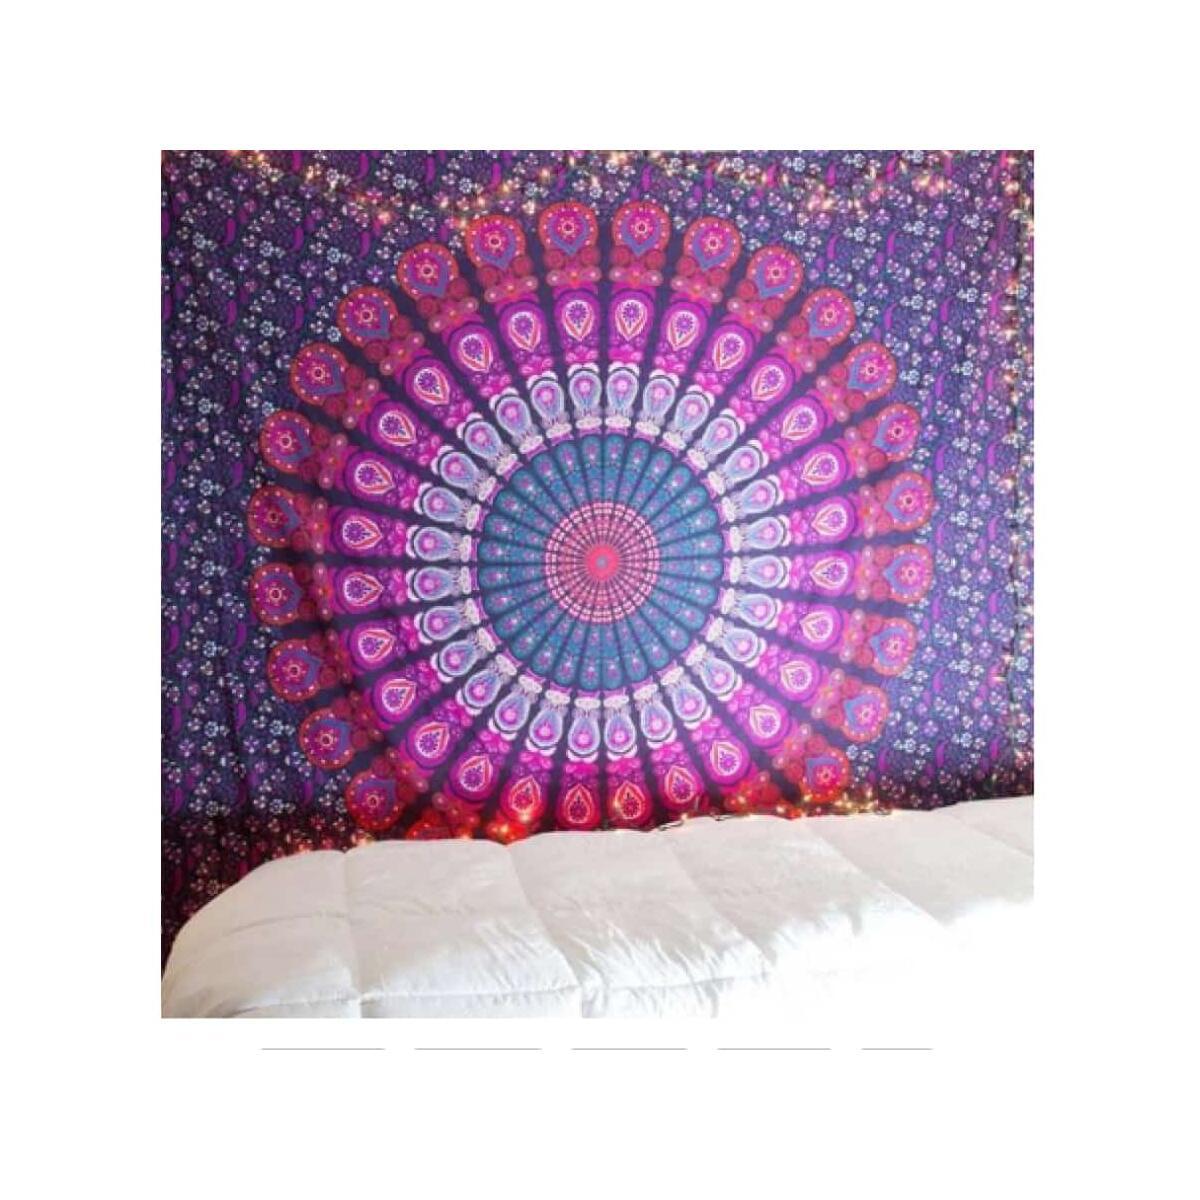 Mandala beach blanket wall hanging decoration towel, 150x130cm thick / Purple